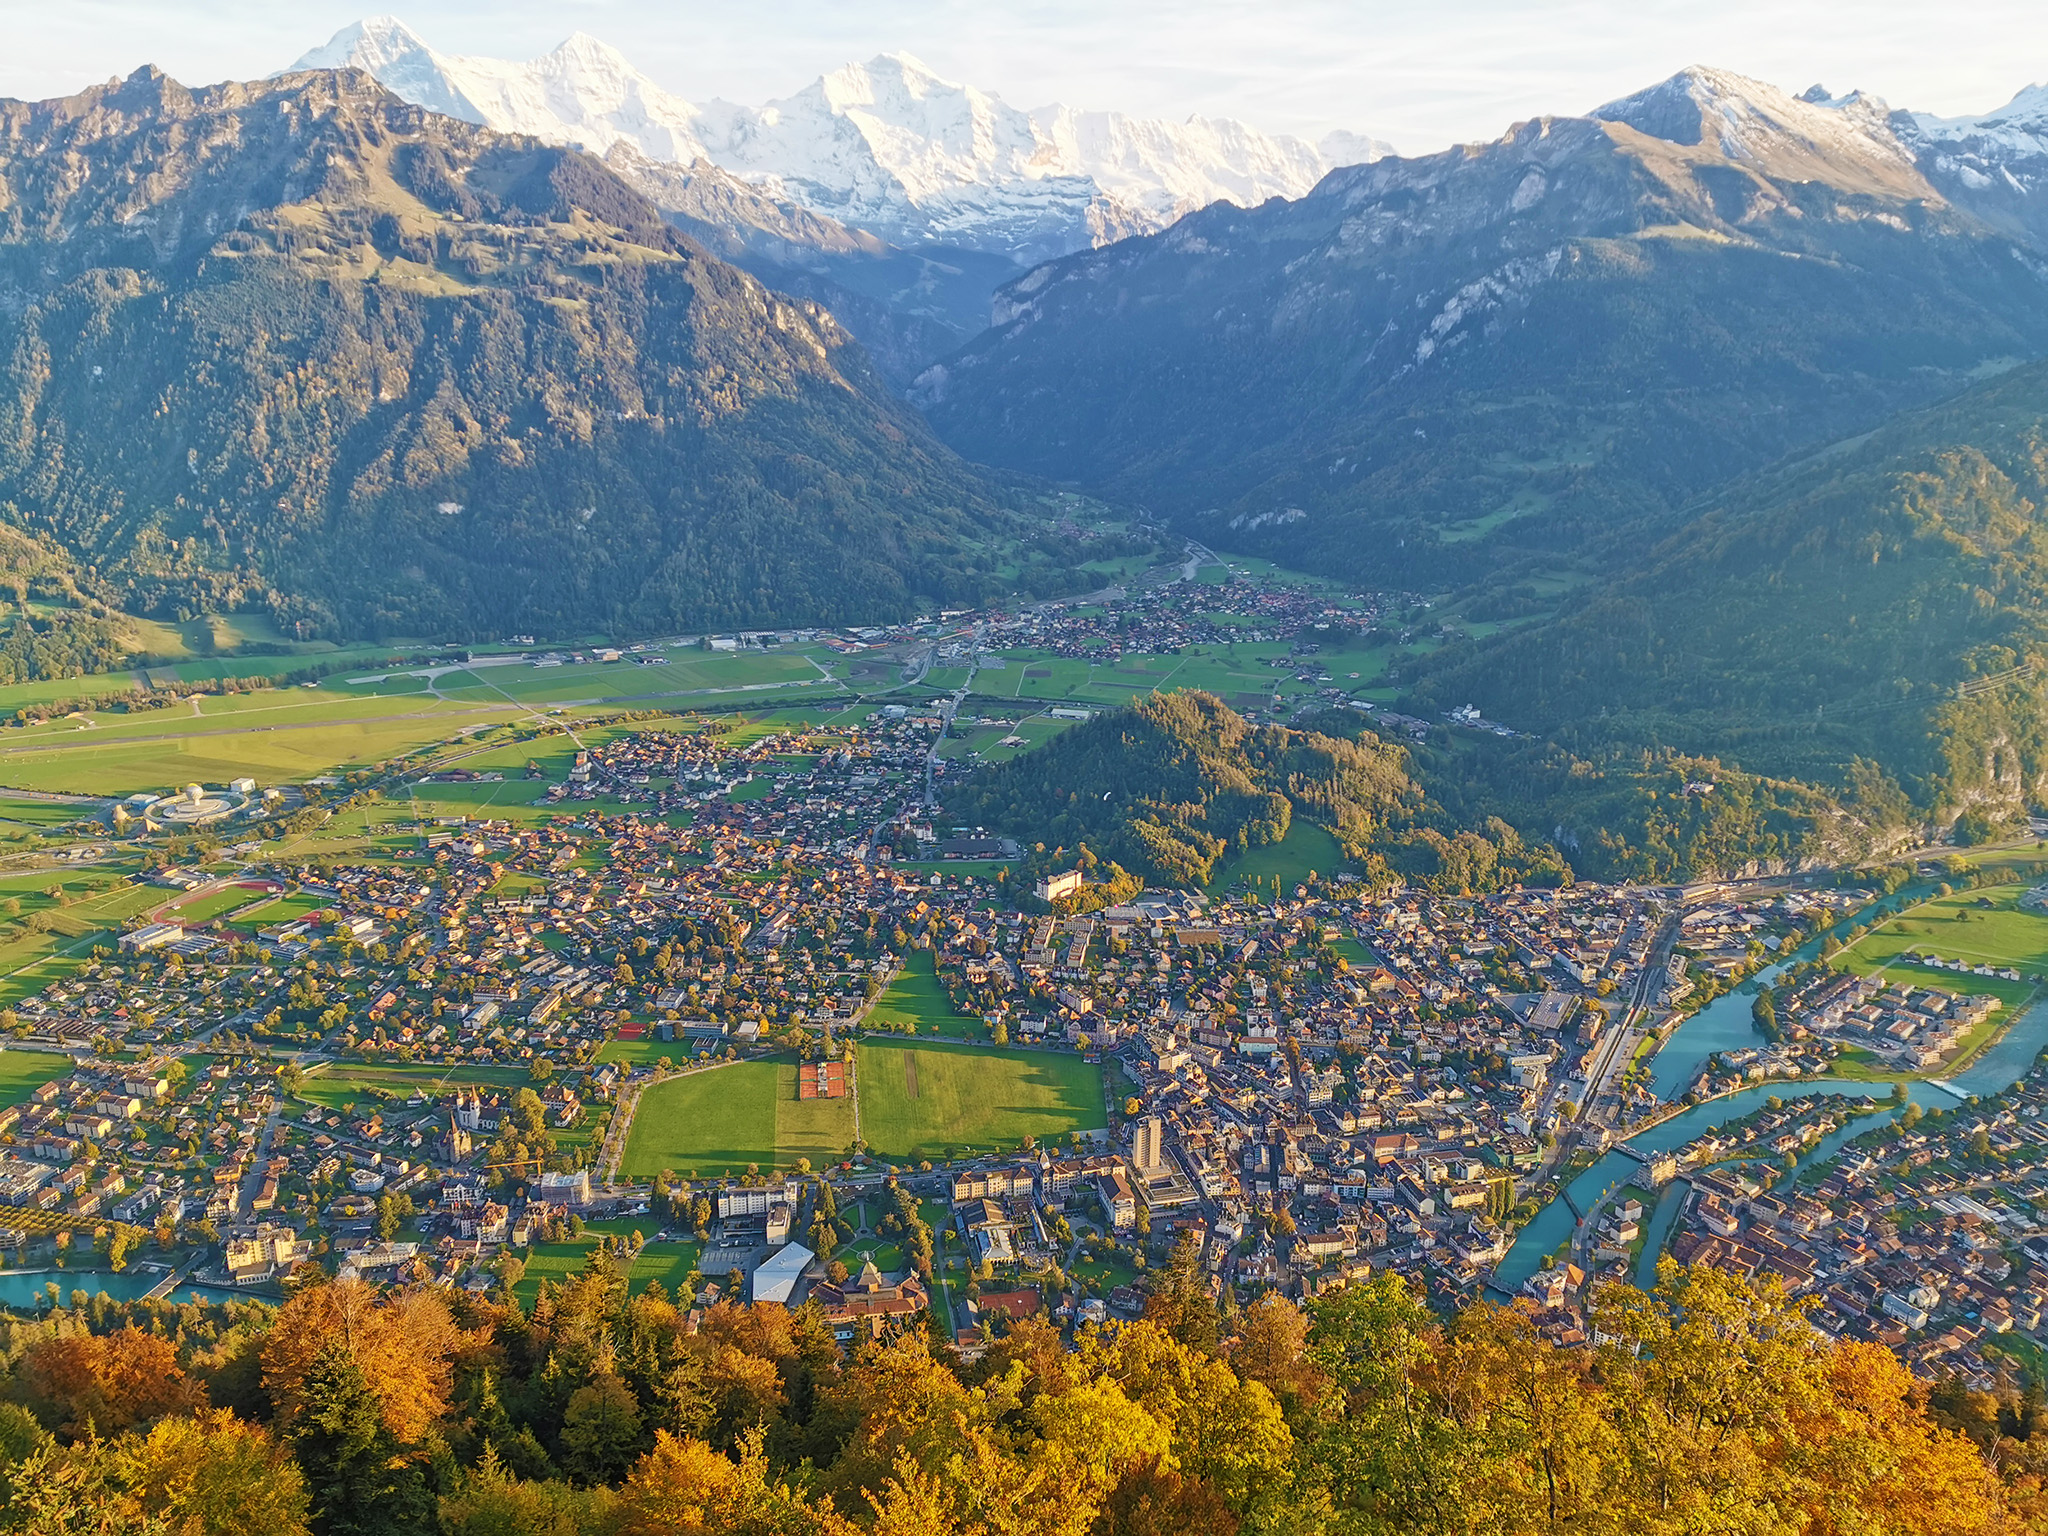 kt_2020_360_Keytours_excursions_Swisstours_interlaken_village7_2048_10